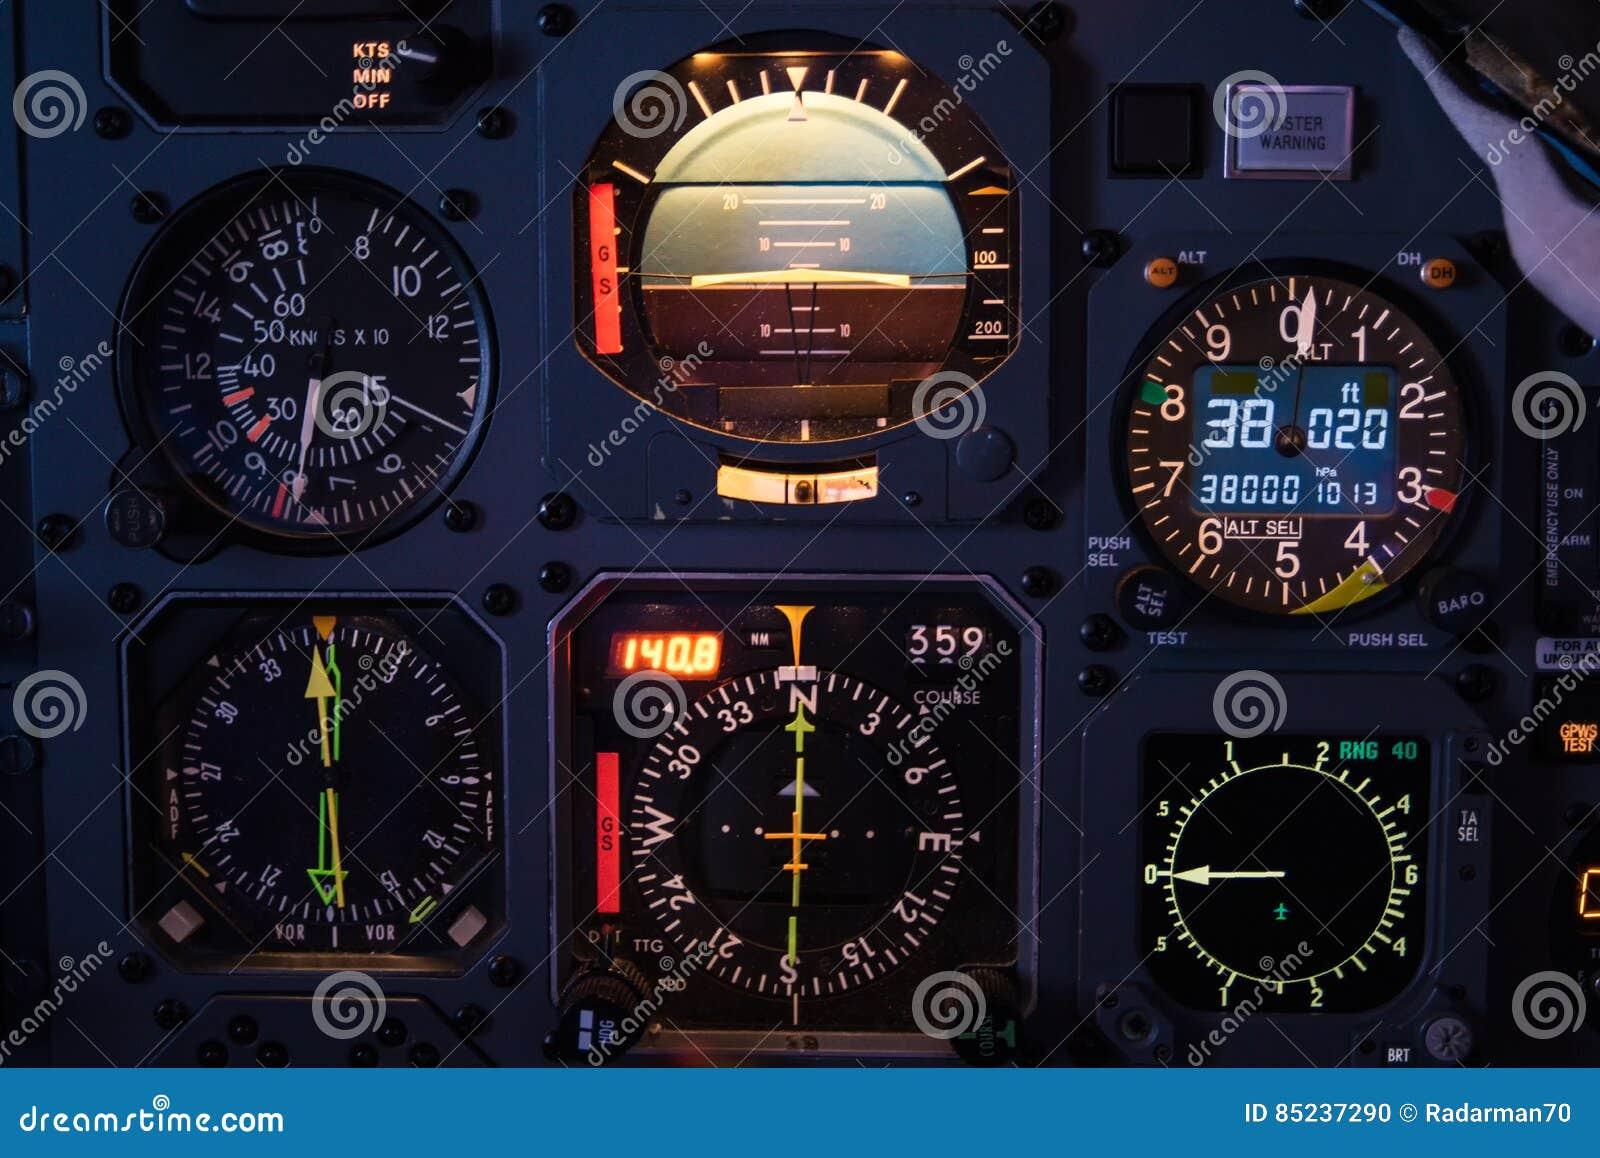 Aircraft Cockpit Instruments Stock Photo Image 85237290